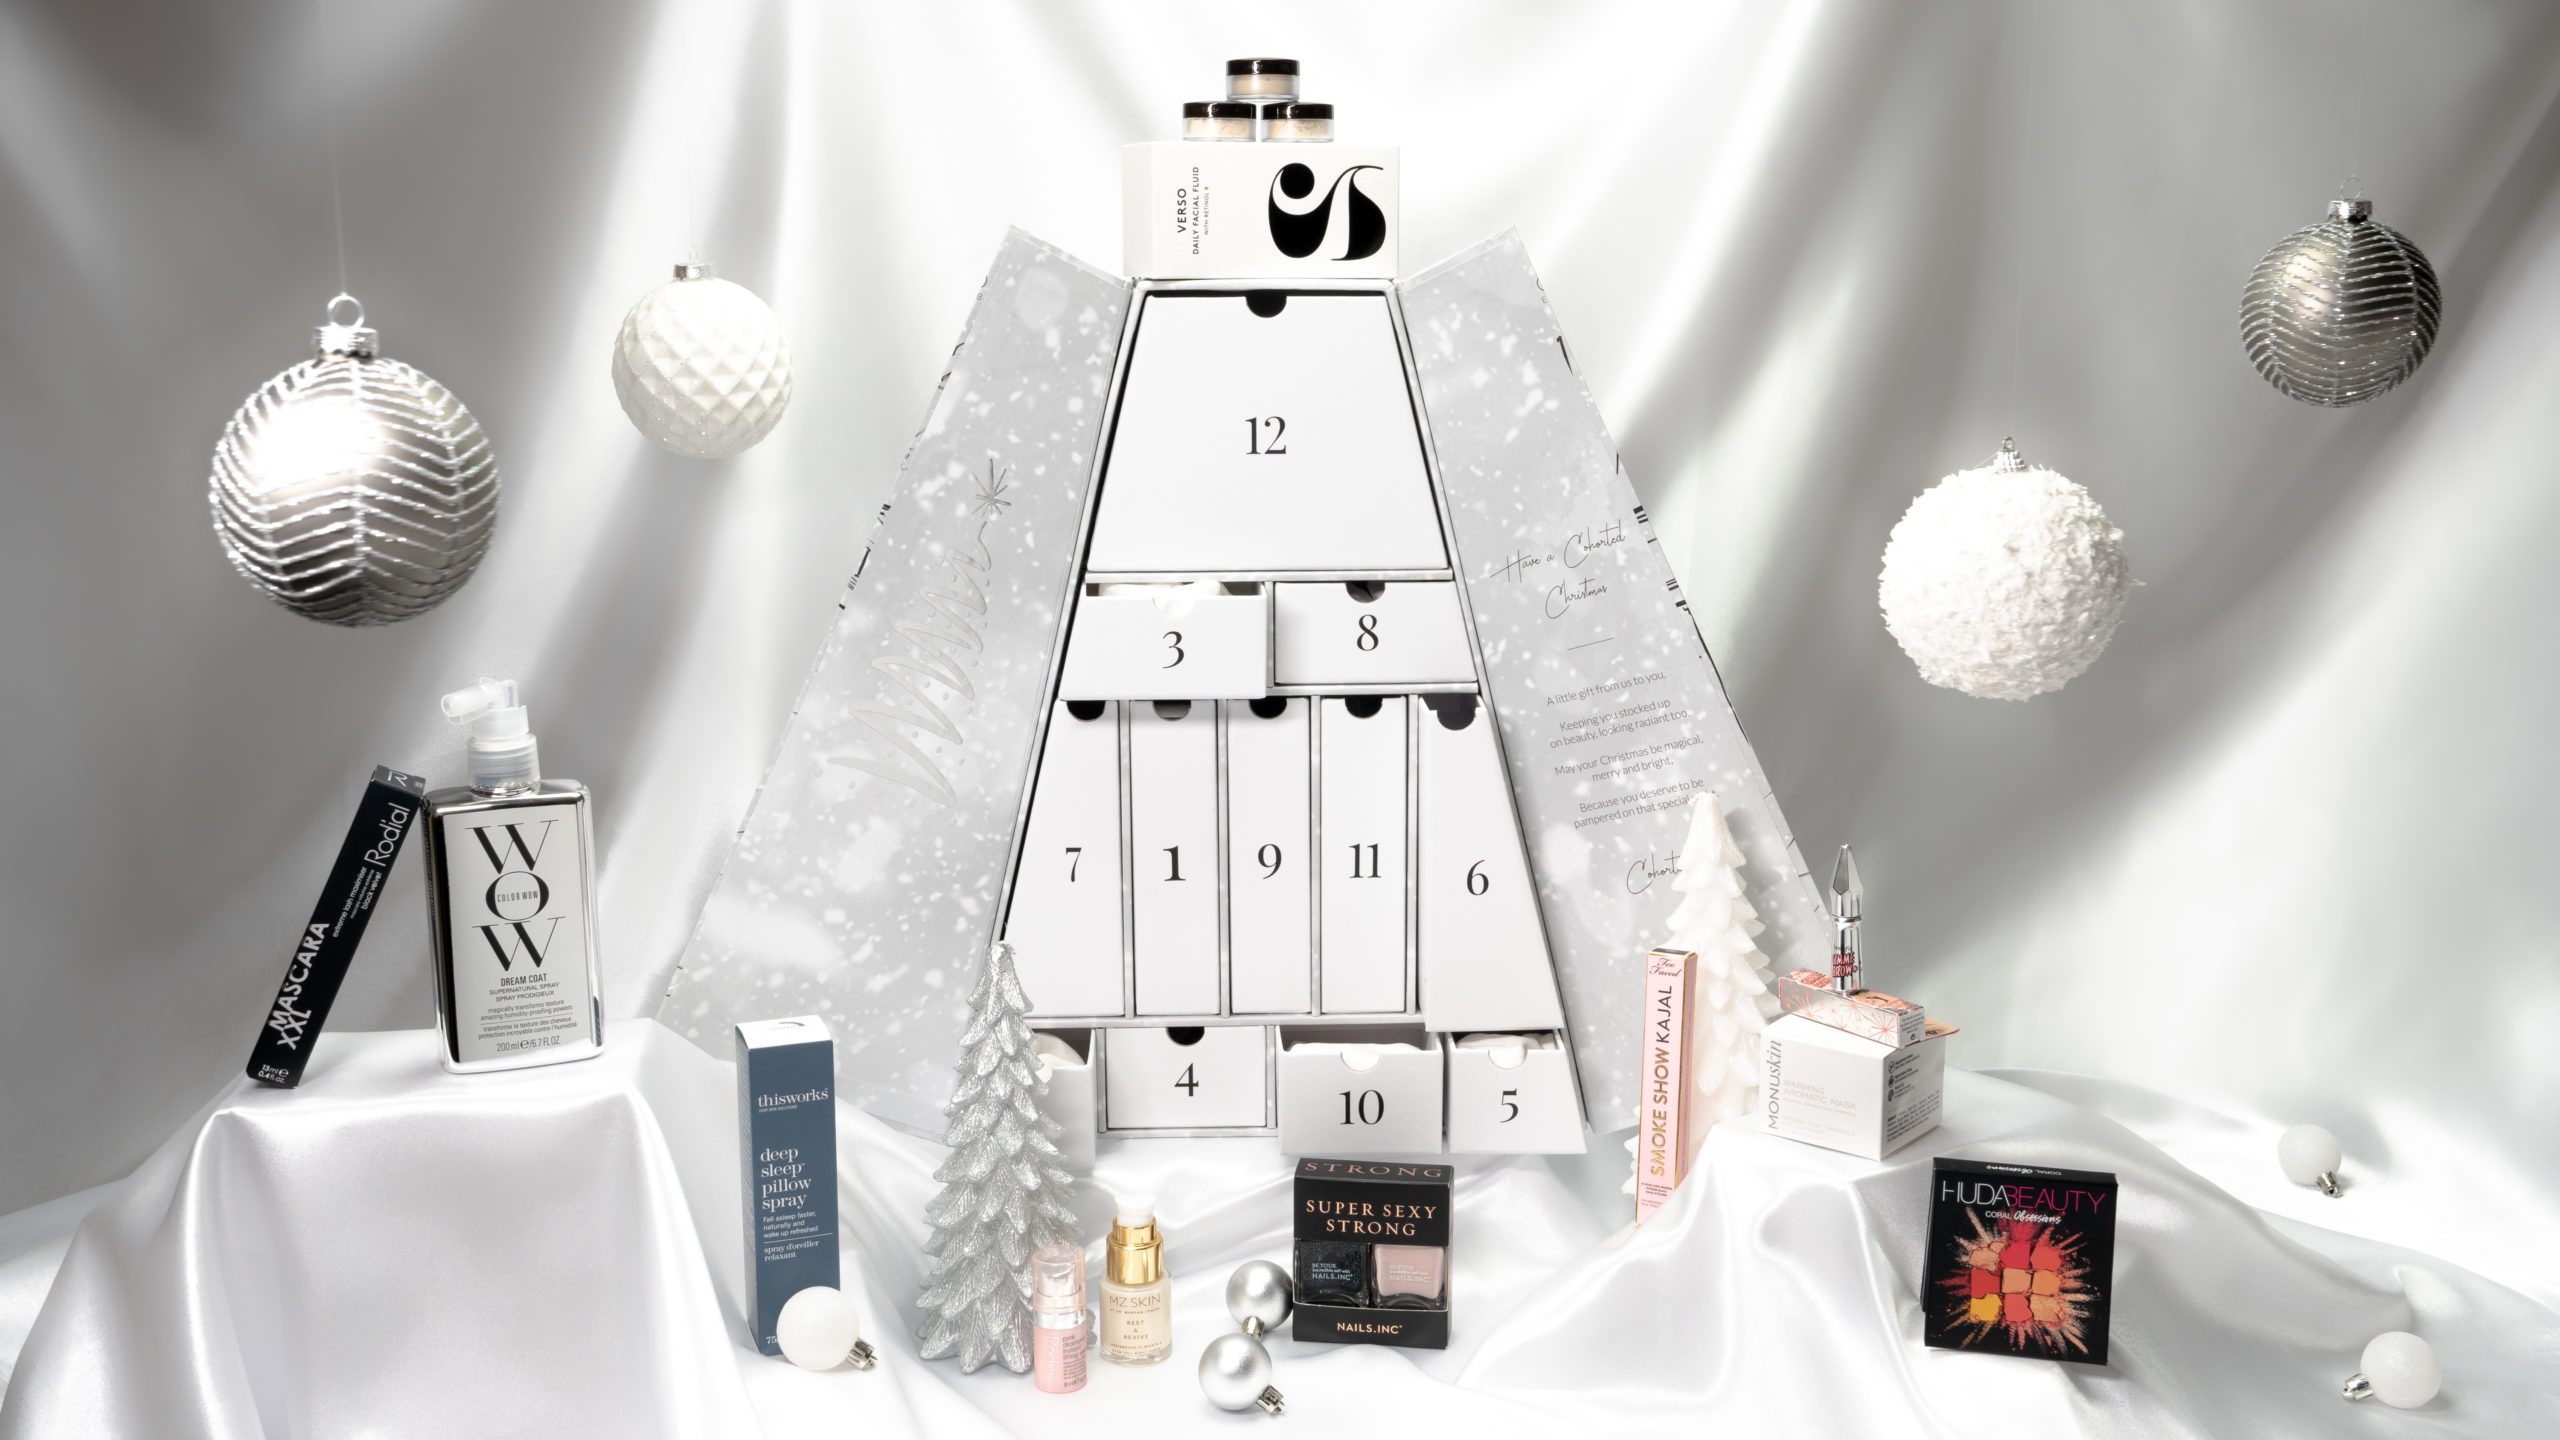 cohorted 12 wishes advent calendar